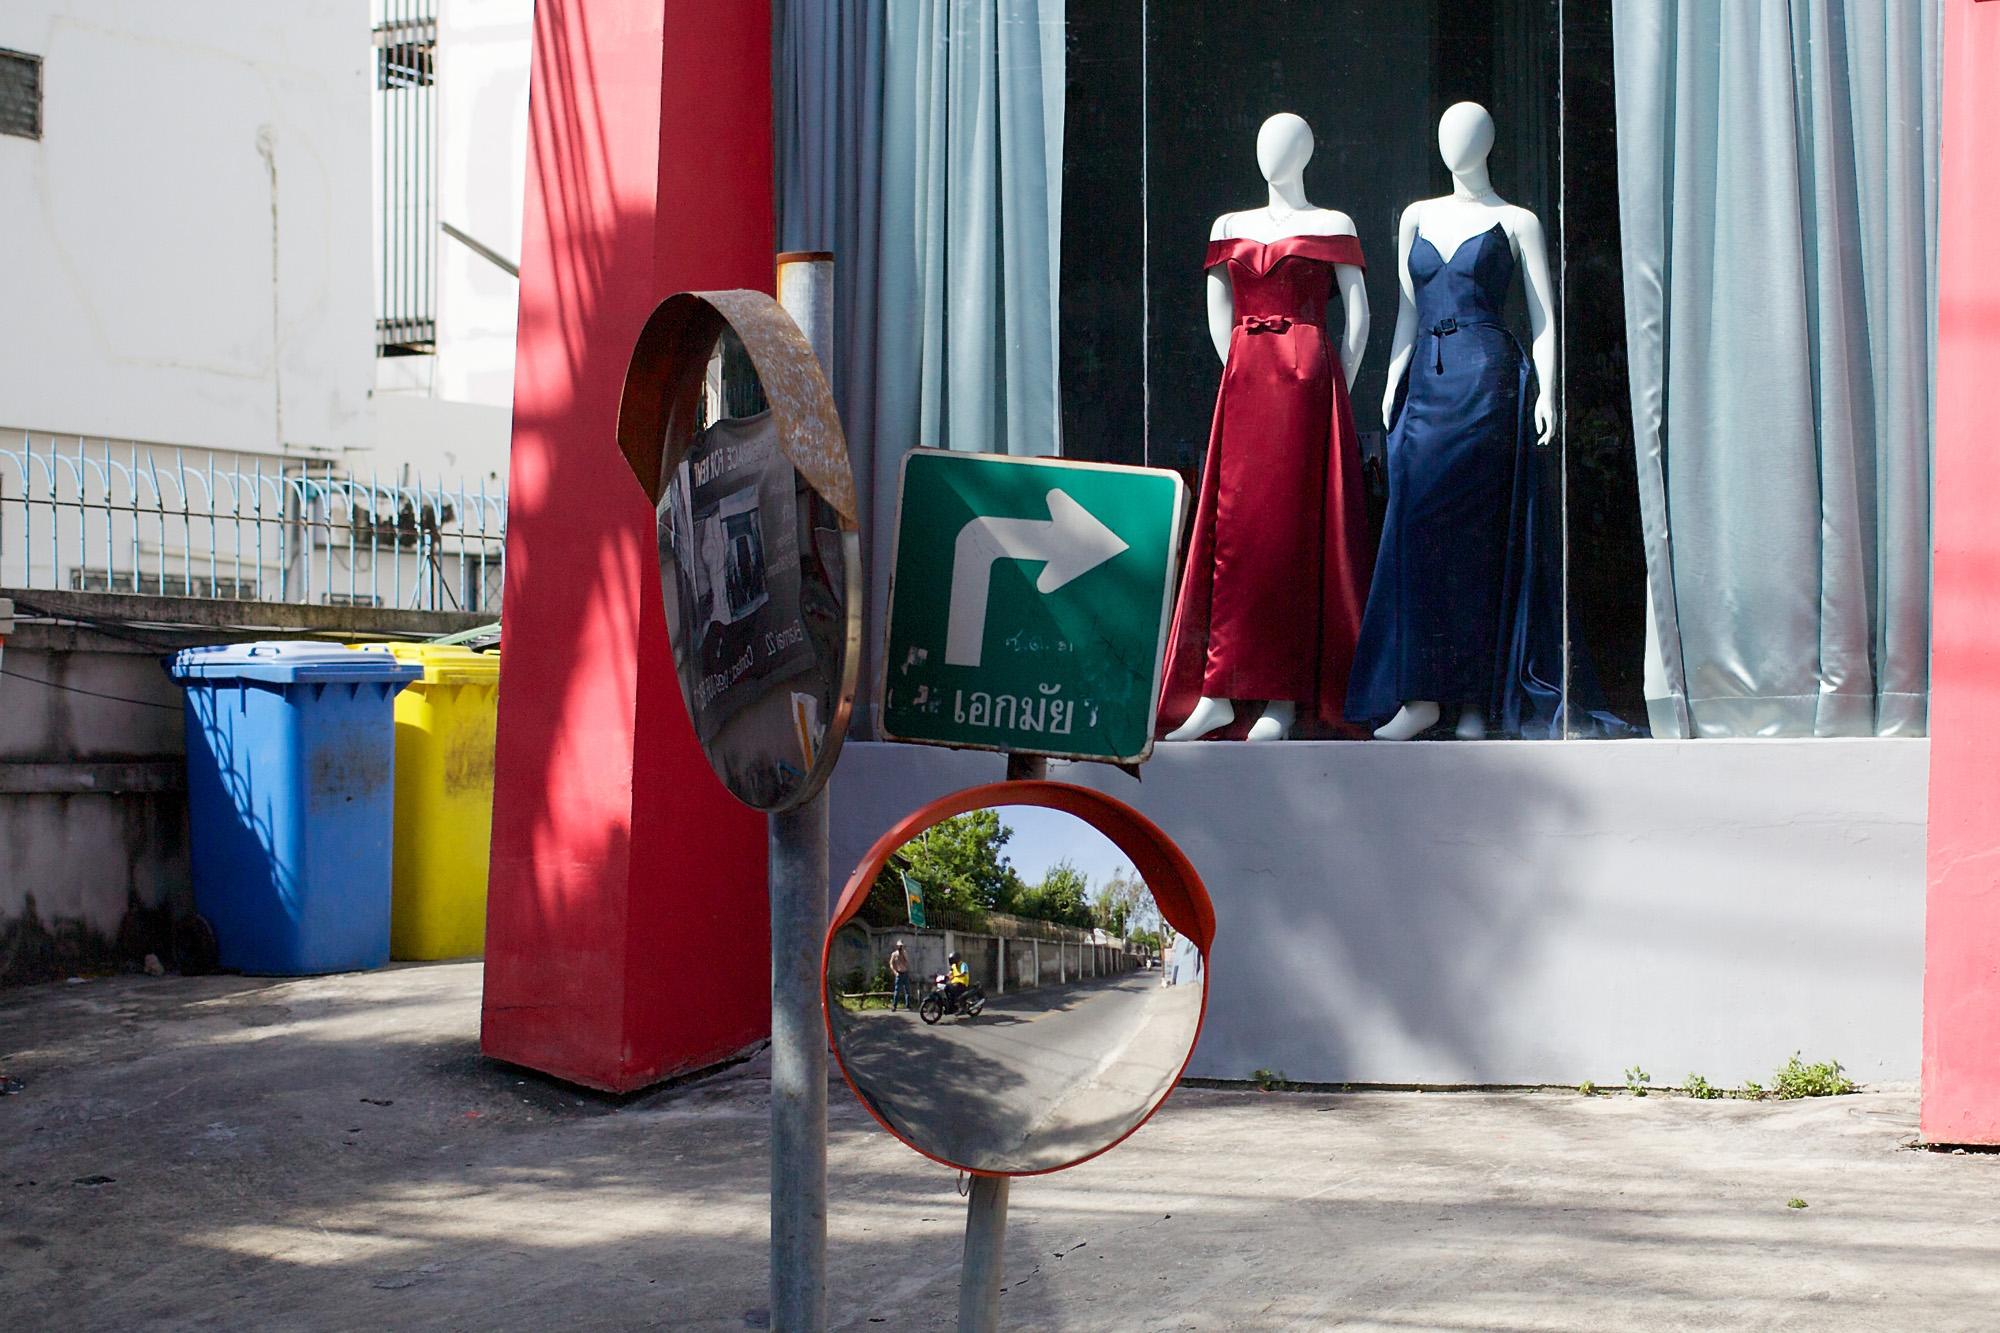 street corner with mirror